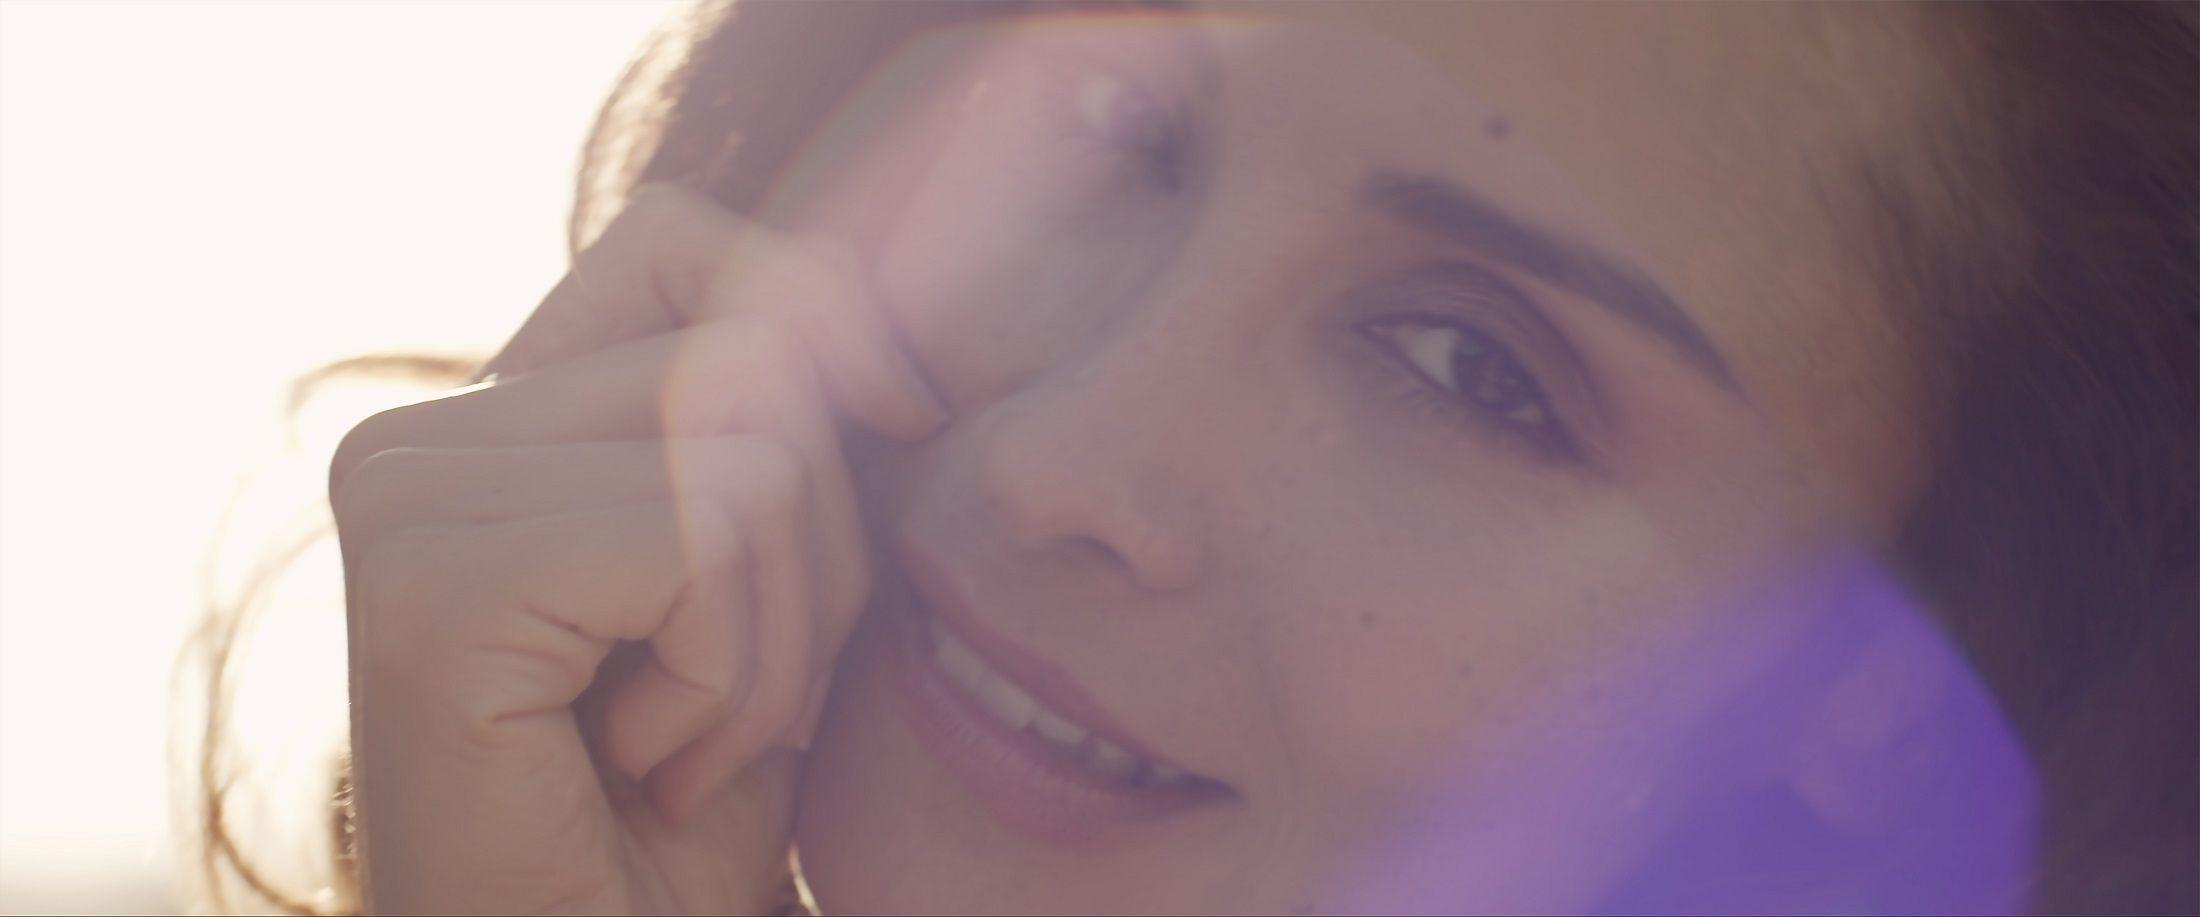 Johanna Sol as Sofia